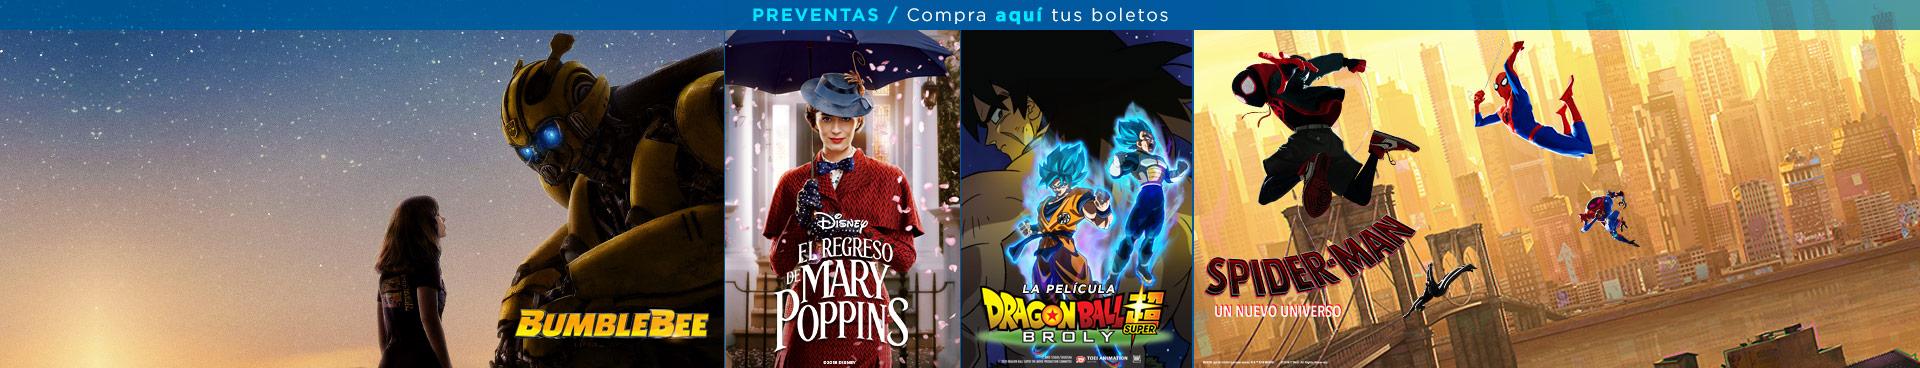 Preventas (Aquaman/ Mary Poppins / Spider-Man)